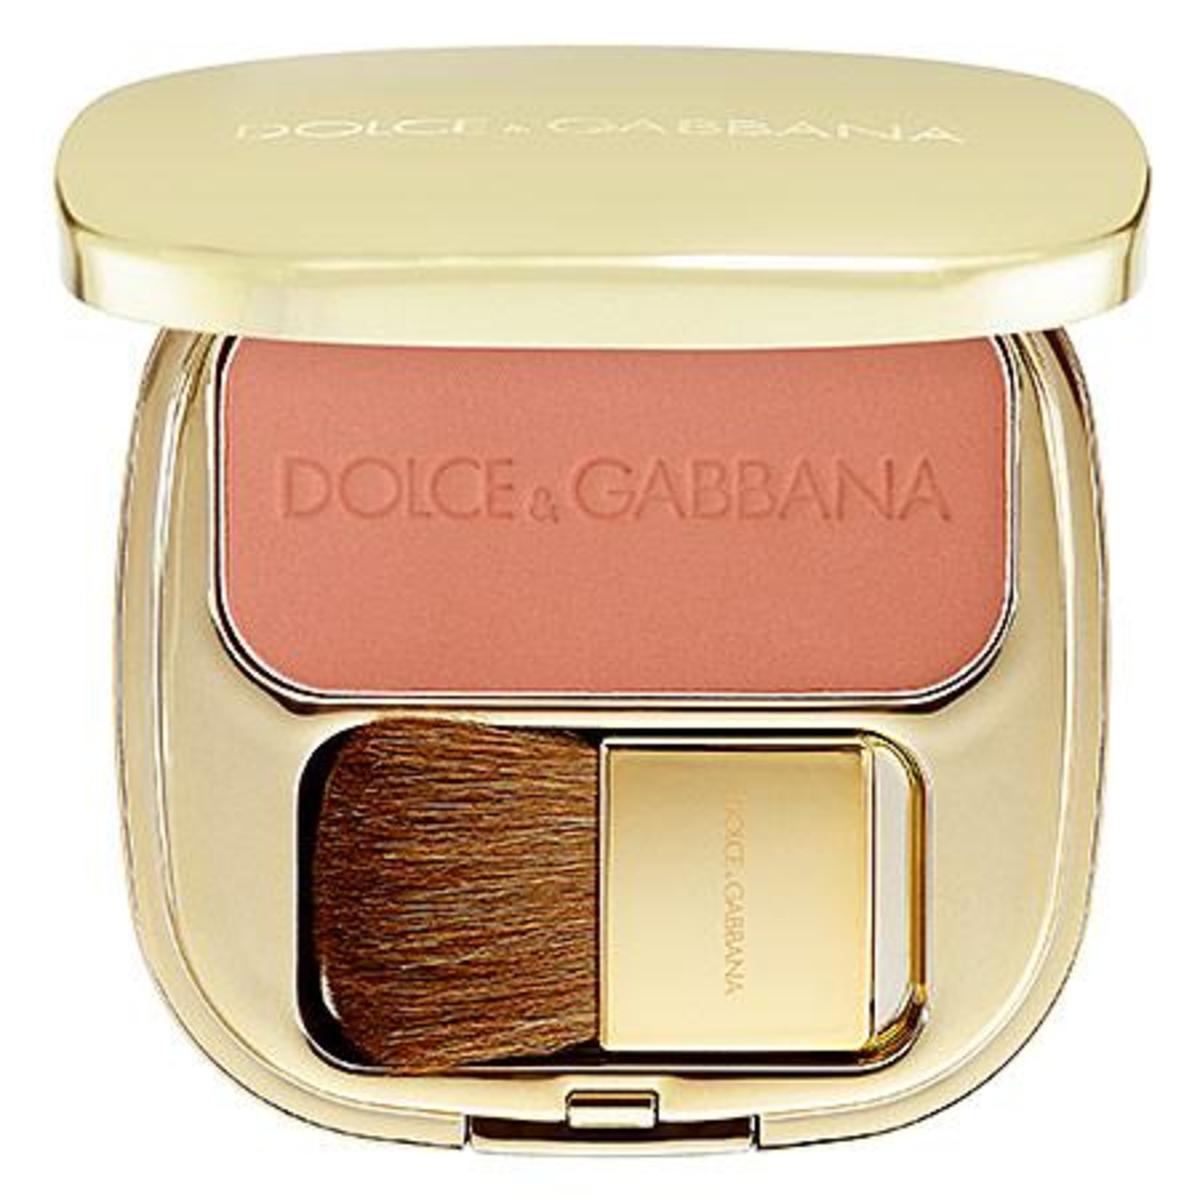 Dolce & Gabbana The Blush Luminous Cheek Colour in Nude 10